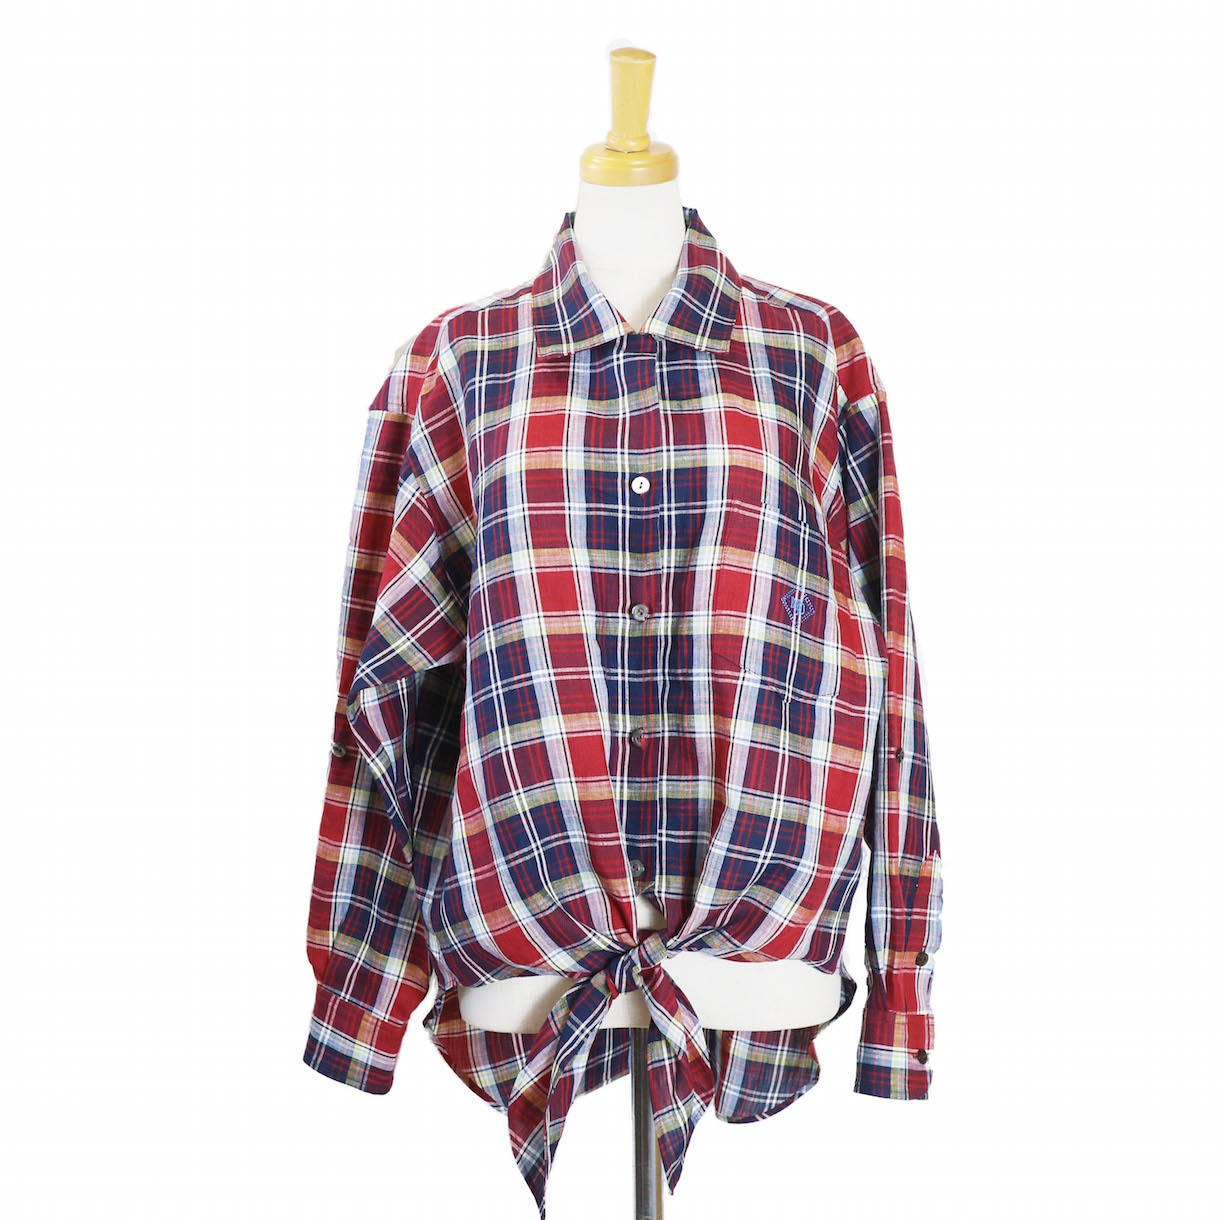 BLUEBIRD BOULEVARD / マドラスチェックオープンカラーシャツ-RED